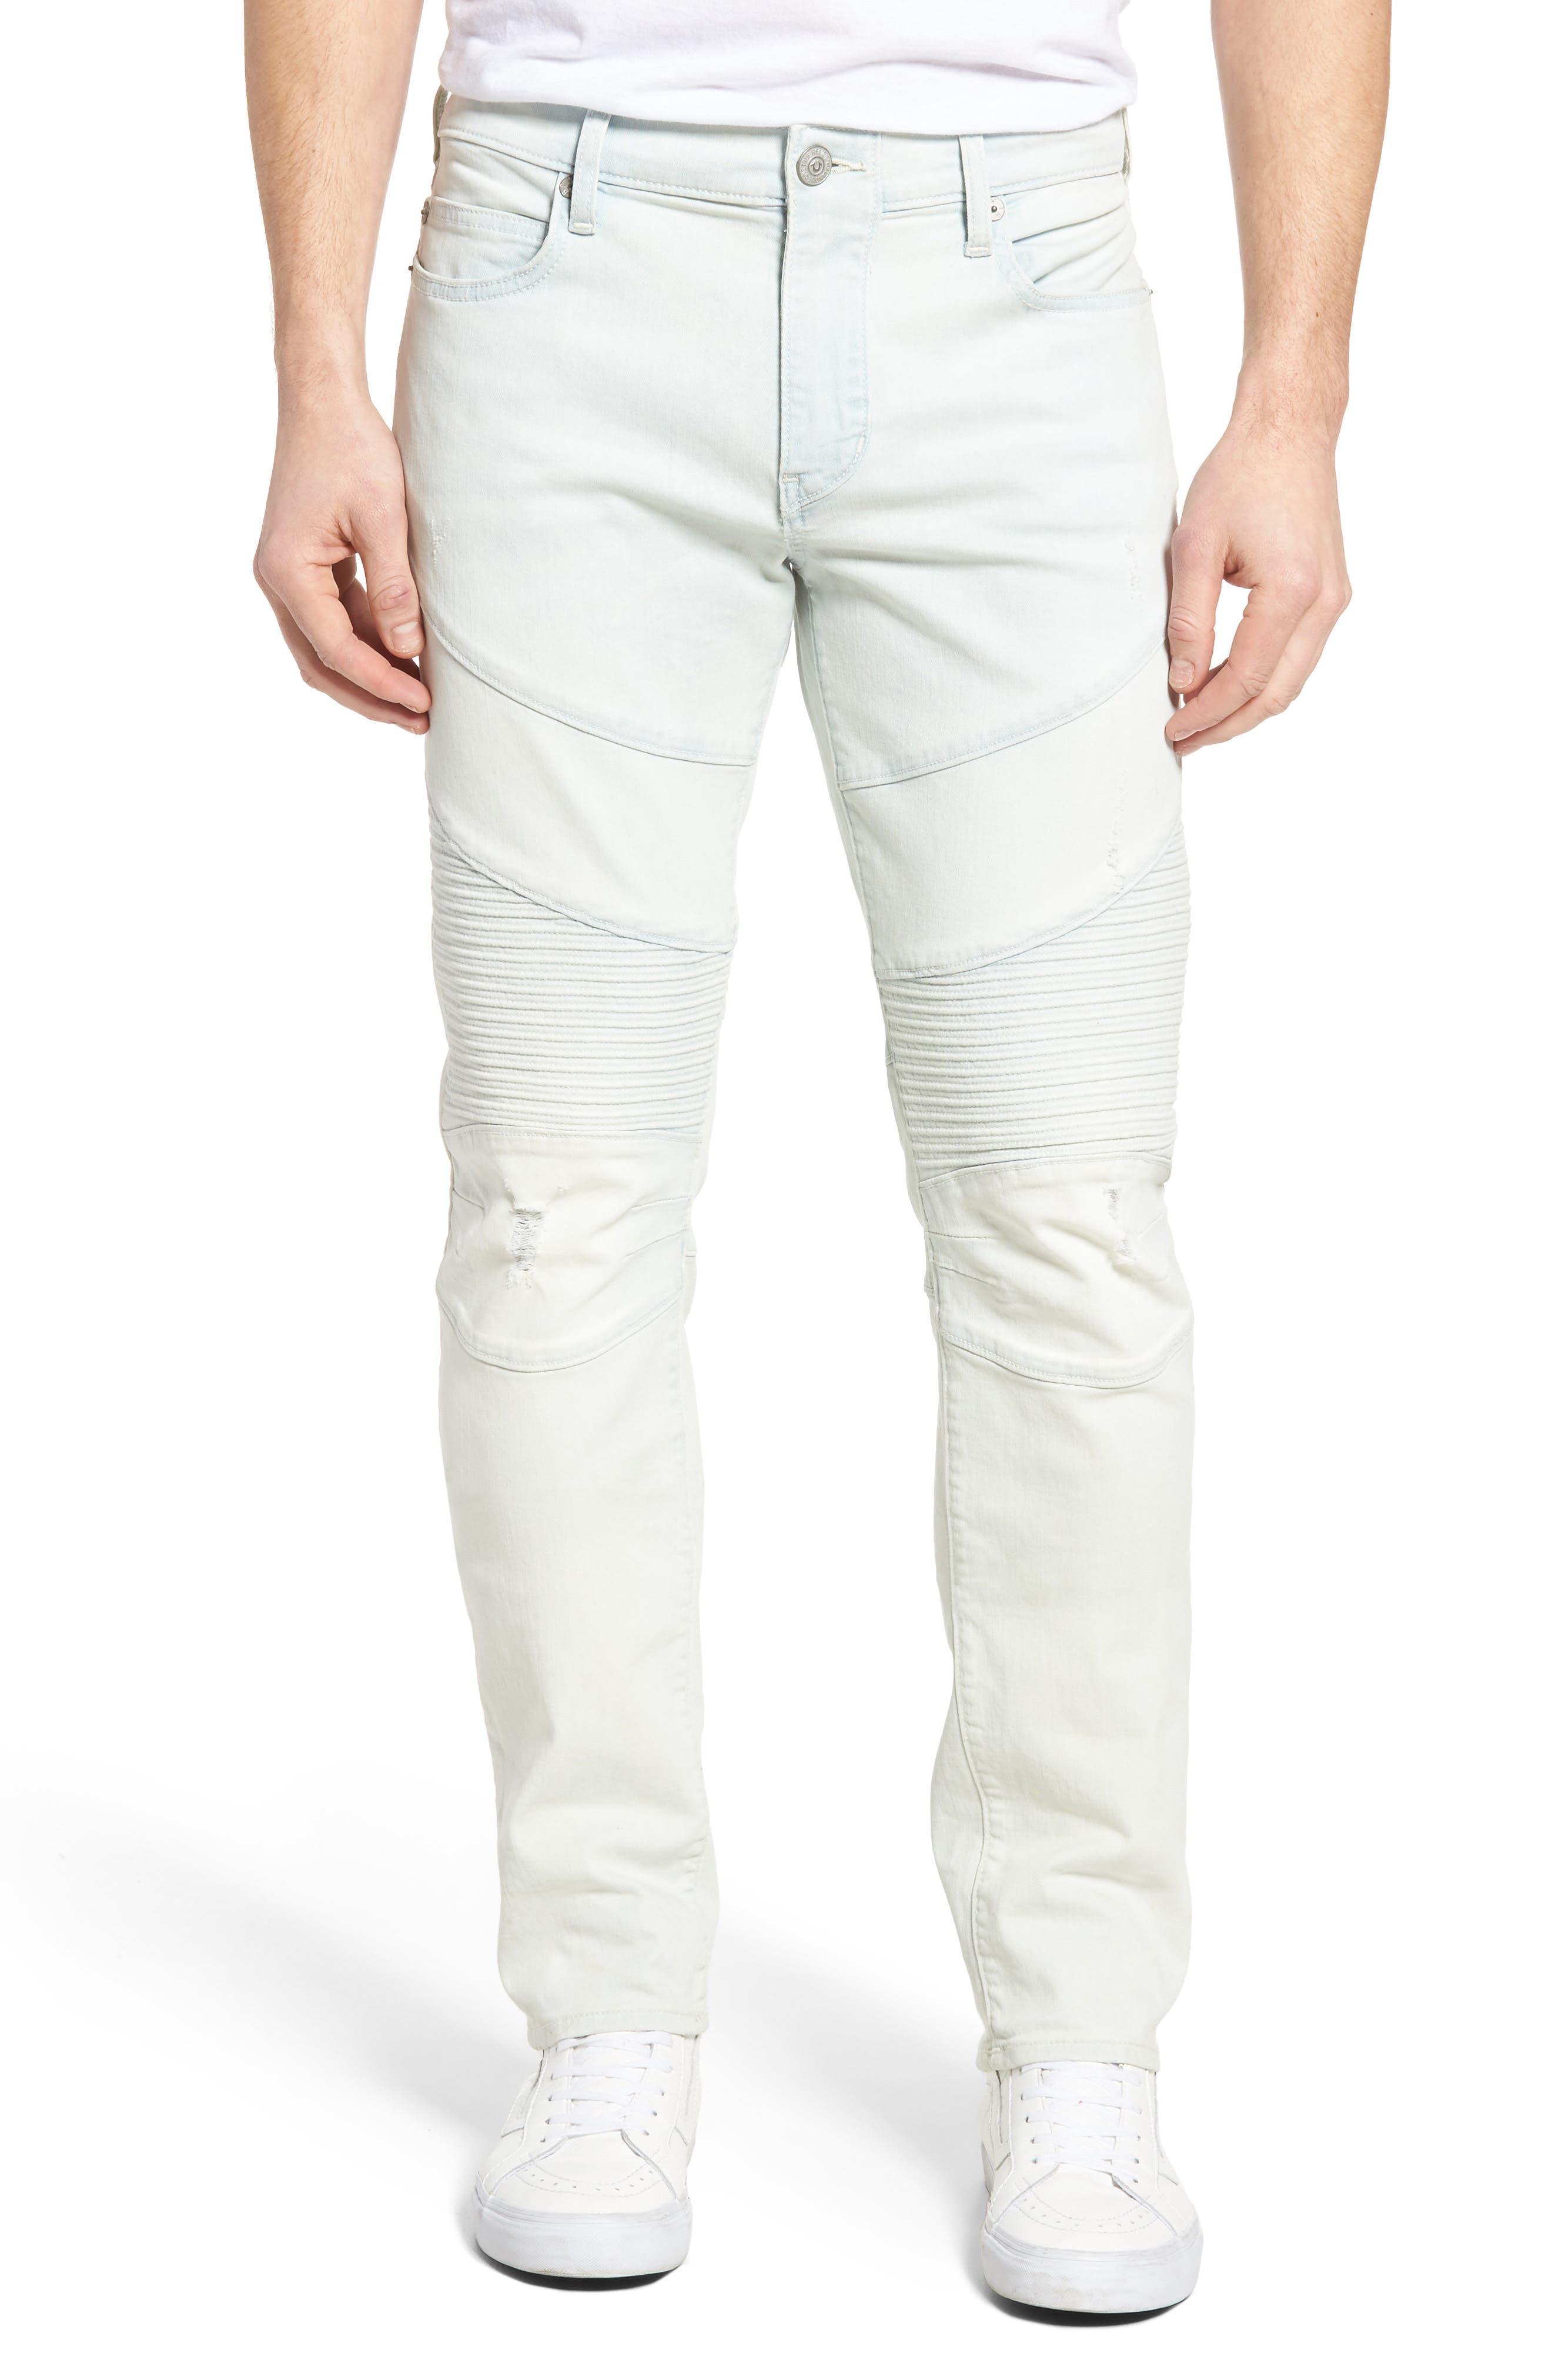 Main Image - True Religion Brand Jeans Rocco Skinny Fit Moto Jeans (Light Daze)